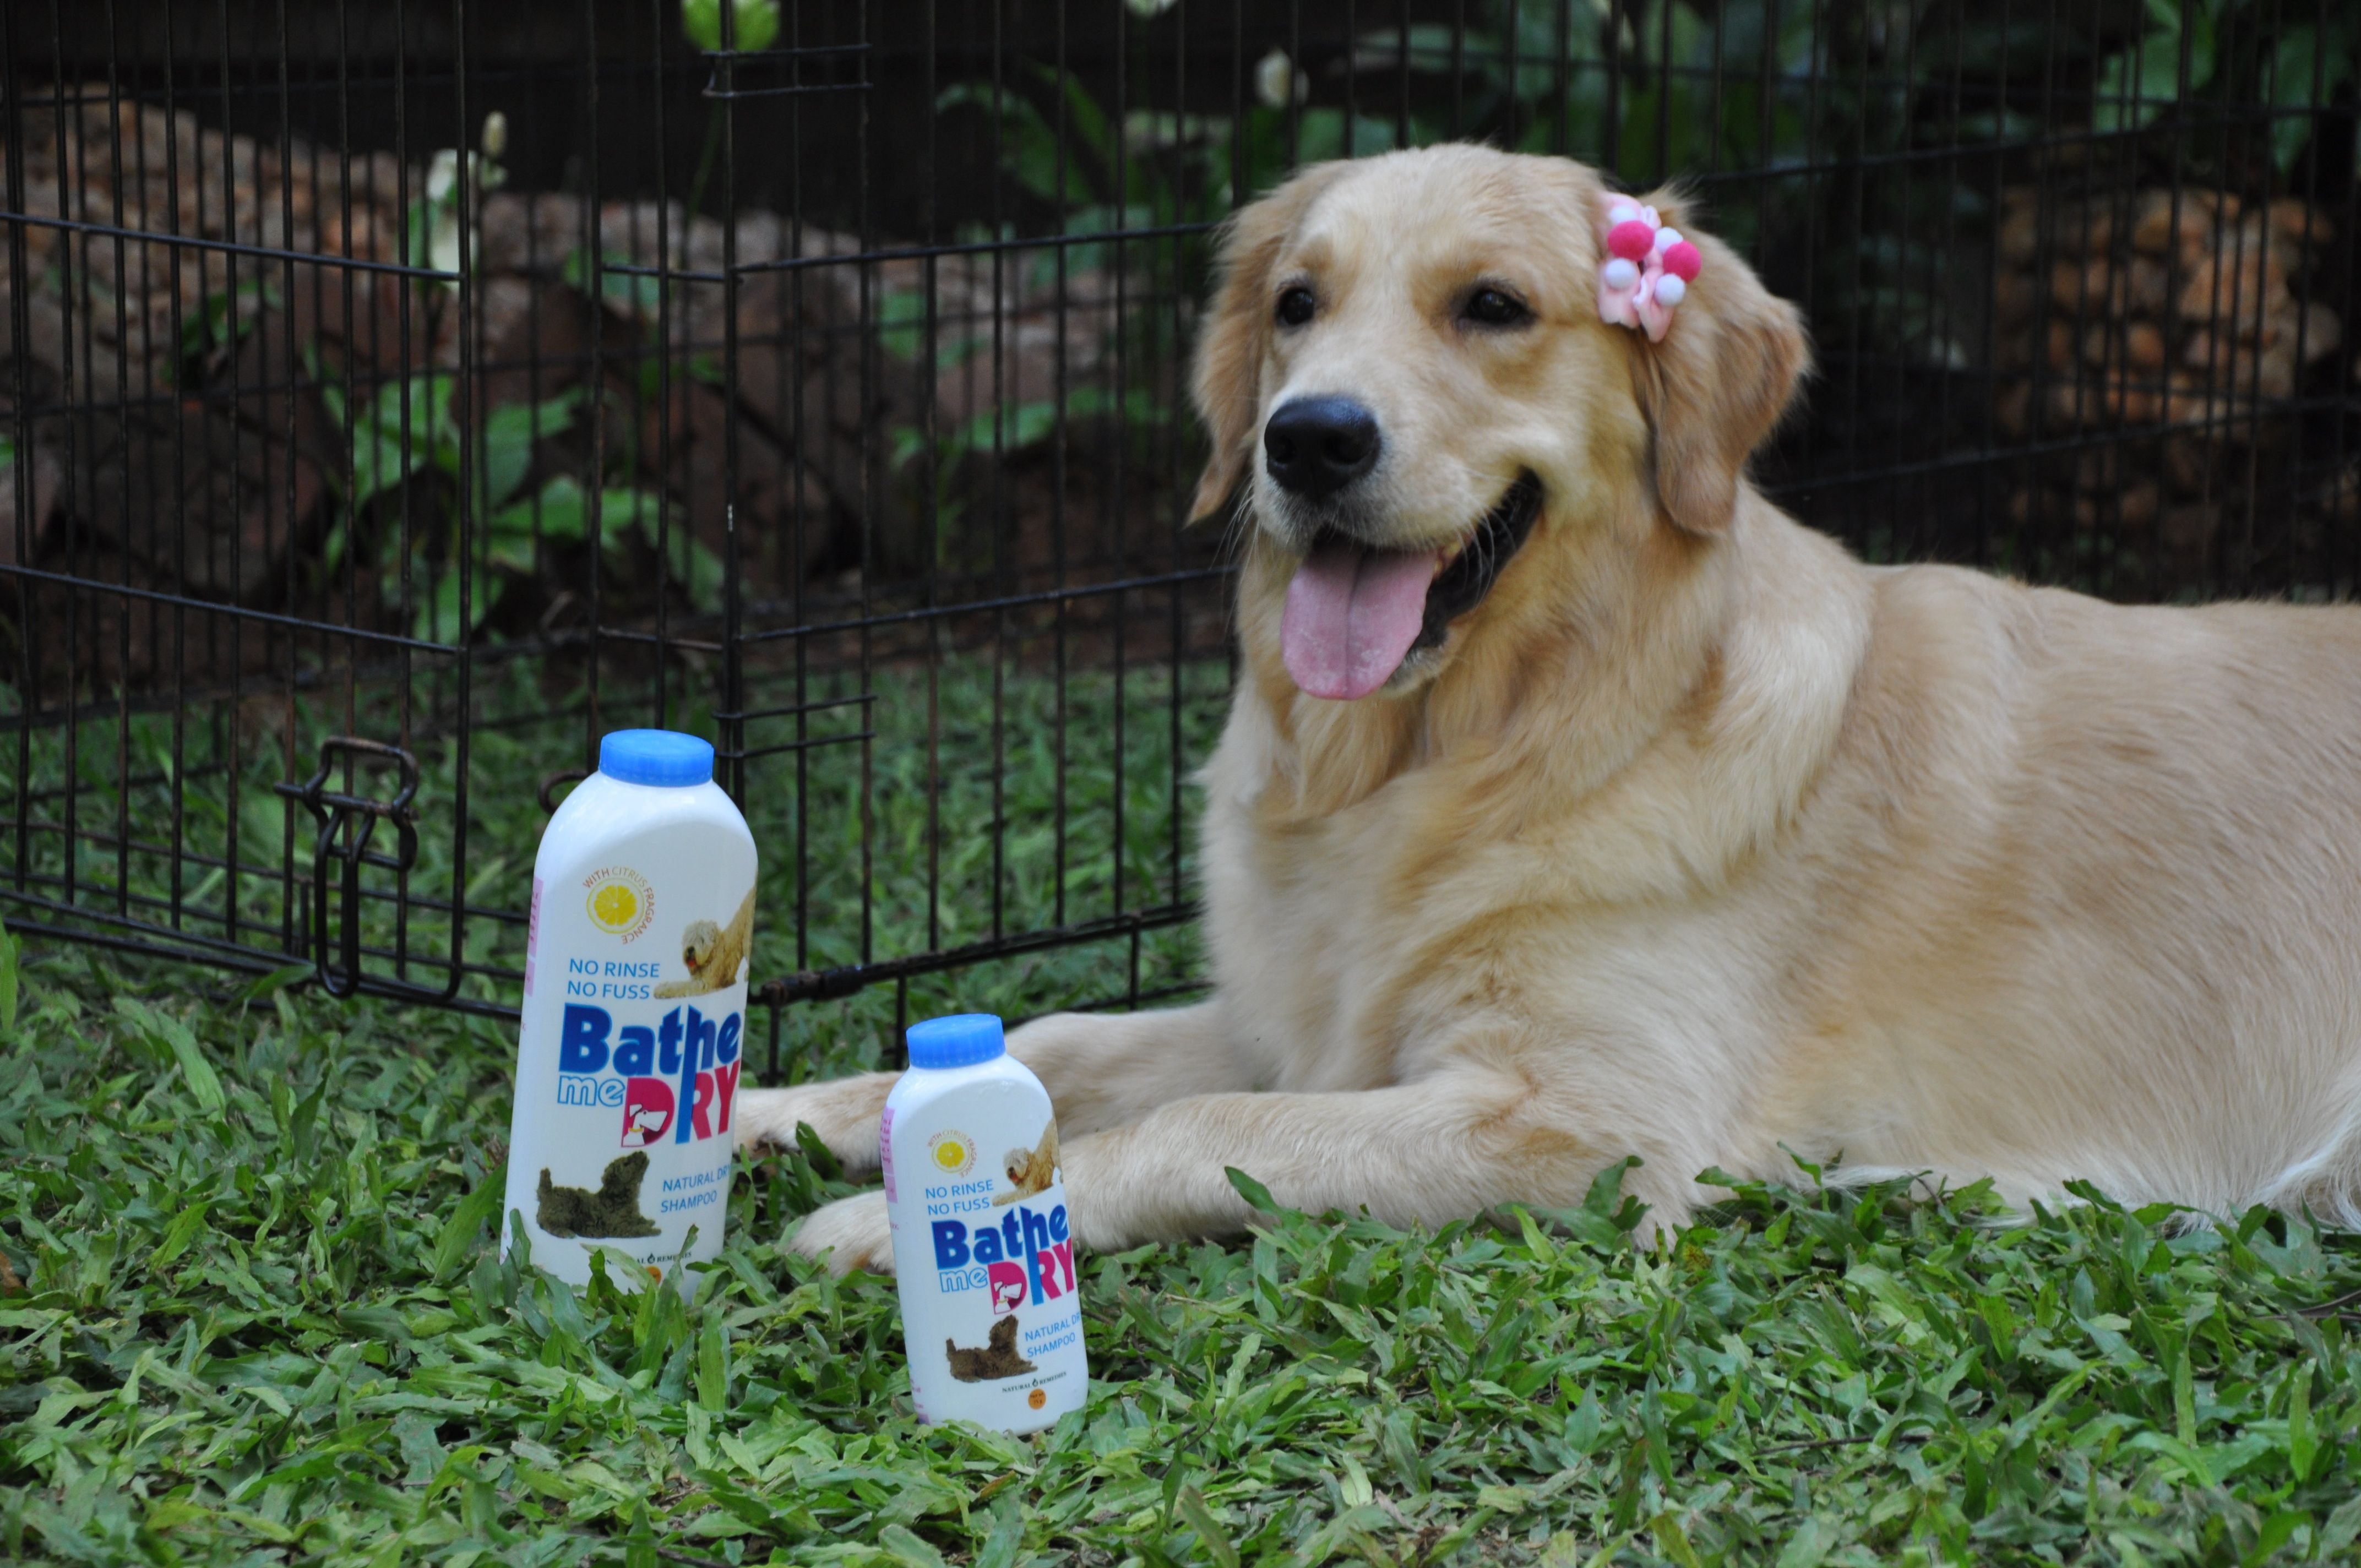 Bathe Me Dry A natural dry shampoo for dogs Dog